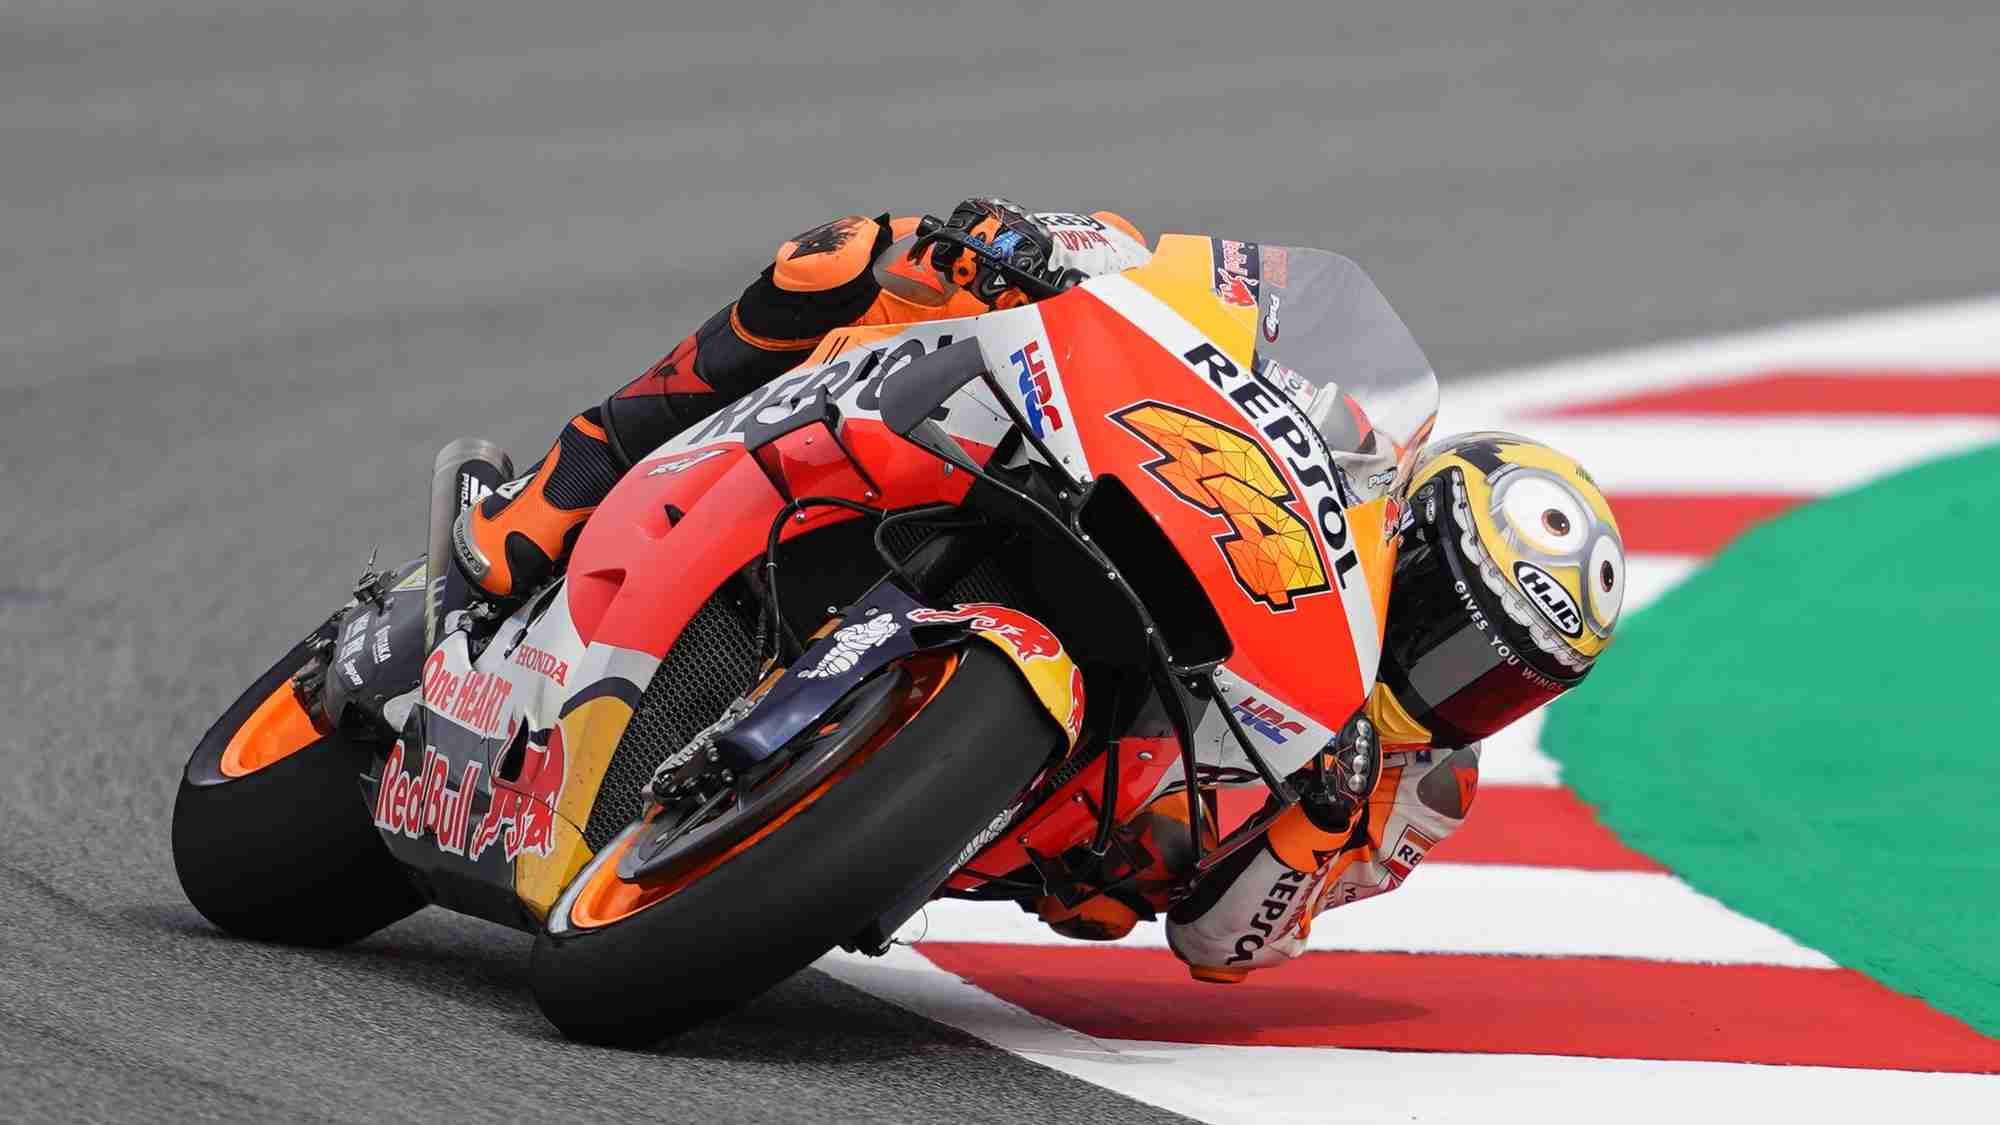 Pol Espargaro Honda MotoGP Catalunya day 1 update